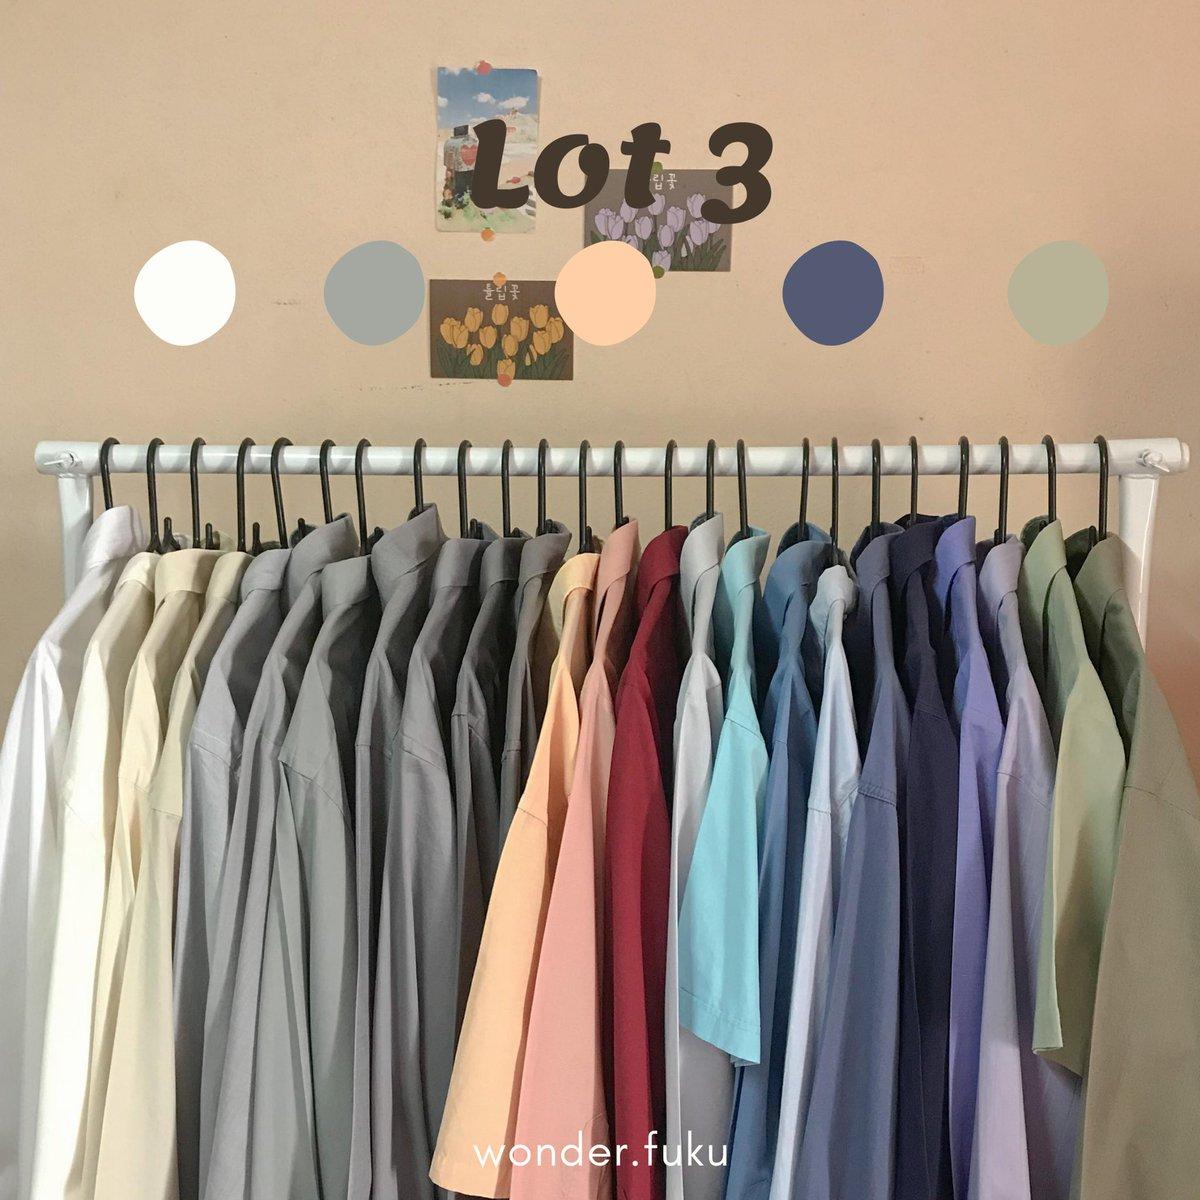 Lot 3  Oversize shirt มือสอง 140 THB (มีแบรนด์ทุกตัวนะ) *ระบุเบอร์แล้วเอฟทางDM  #เสื้อผ้ามือ2  #เสื้อเชิ้ตเกาหลี #เสื้อเชิ้ตสีพื้น #เสื้อผ้าแฟชั่นเกาหลี #เสื้อผ้าราคาถูก #เสื้อเชิ้ตแขนยาว #เสื้อเชิ้ตคอจีน  #เสื้อเชิ้ตoversize #oversizeshirt #เสื้อเชิ้ตoversizepic.twitter.com/agxmMjQWWN